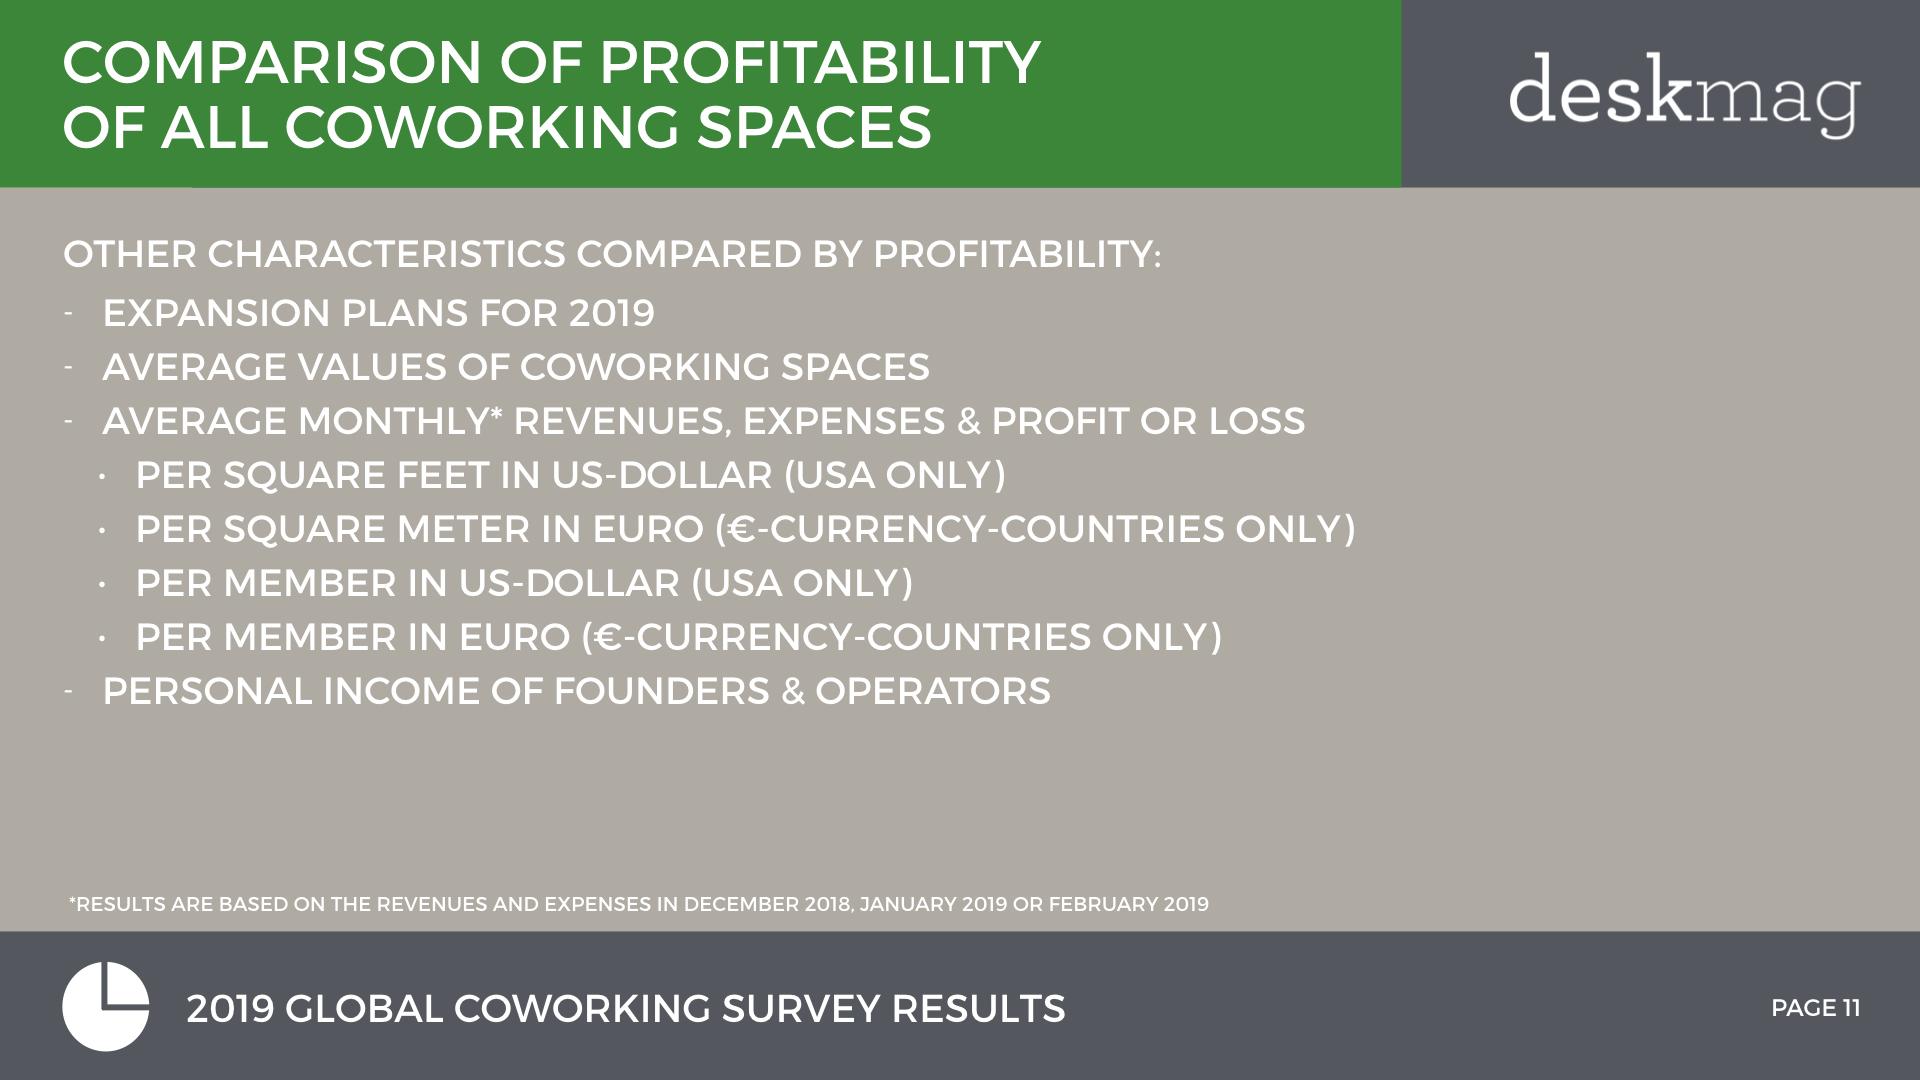 2019 GCS - Profitability - Final Version.011.jpeg